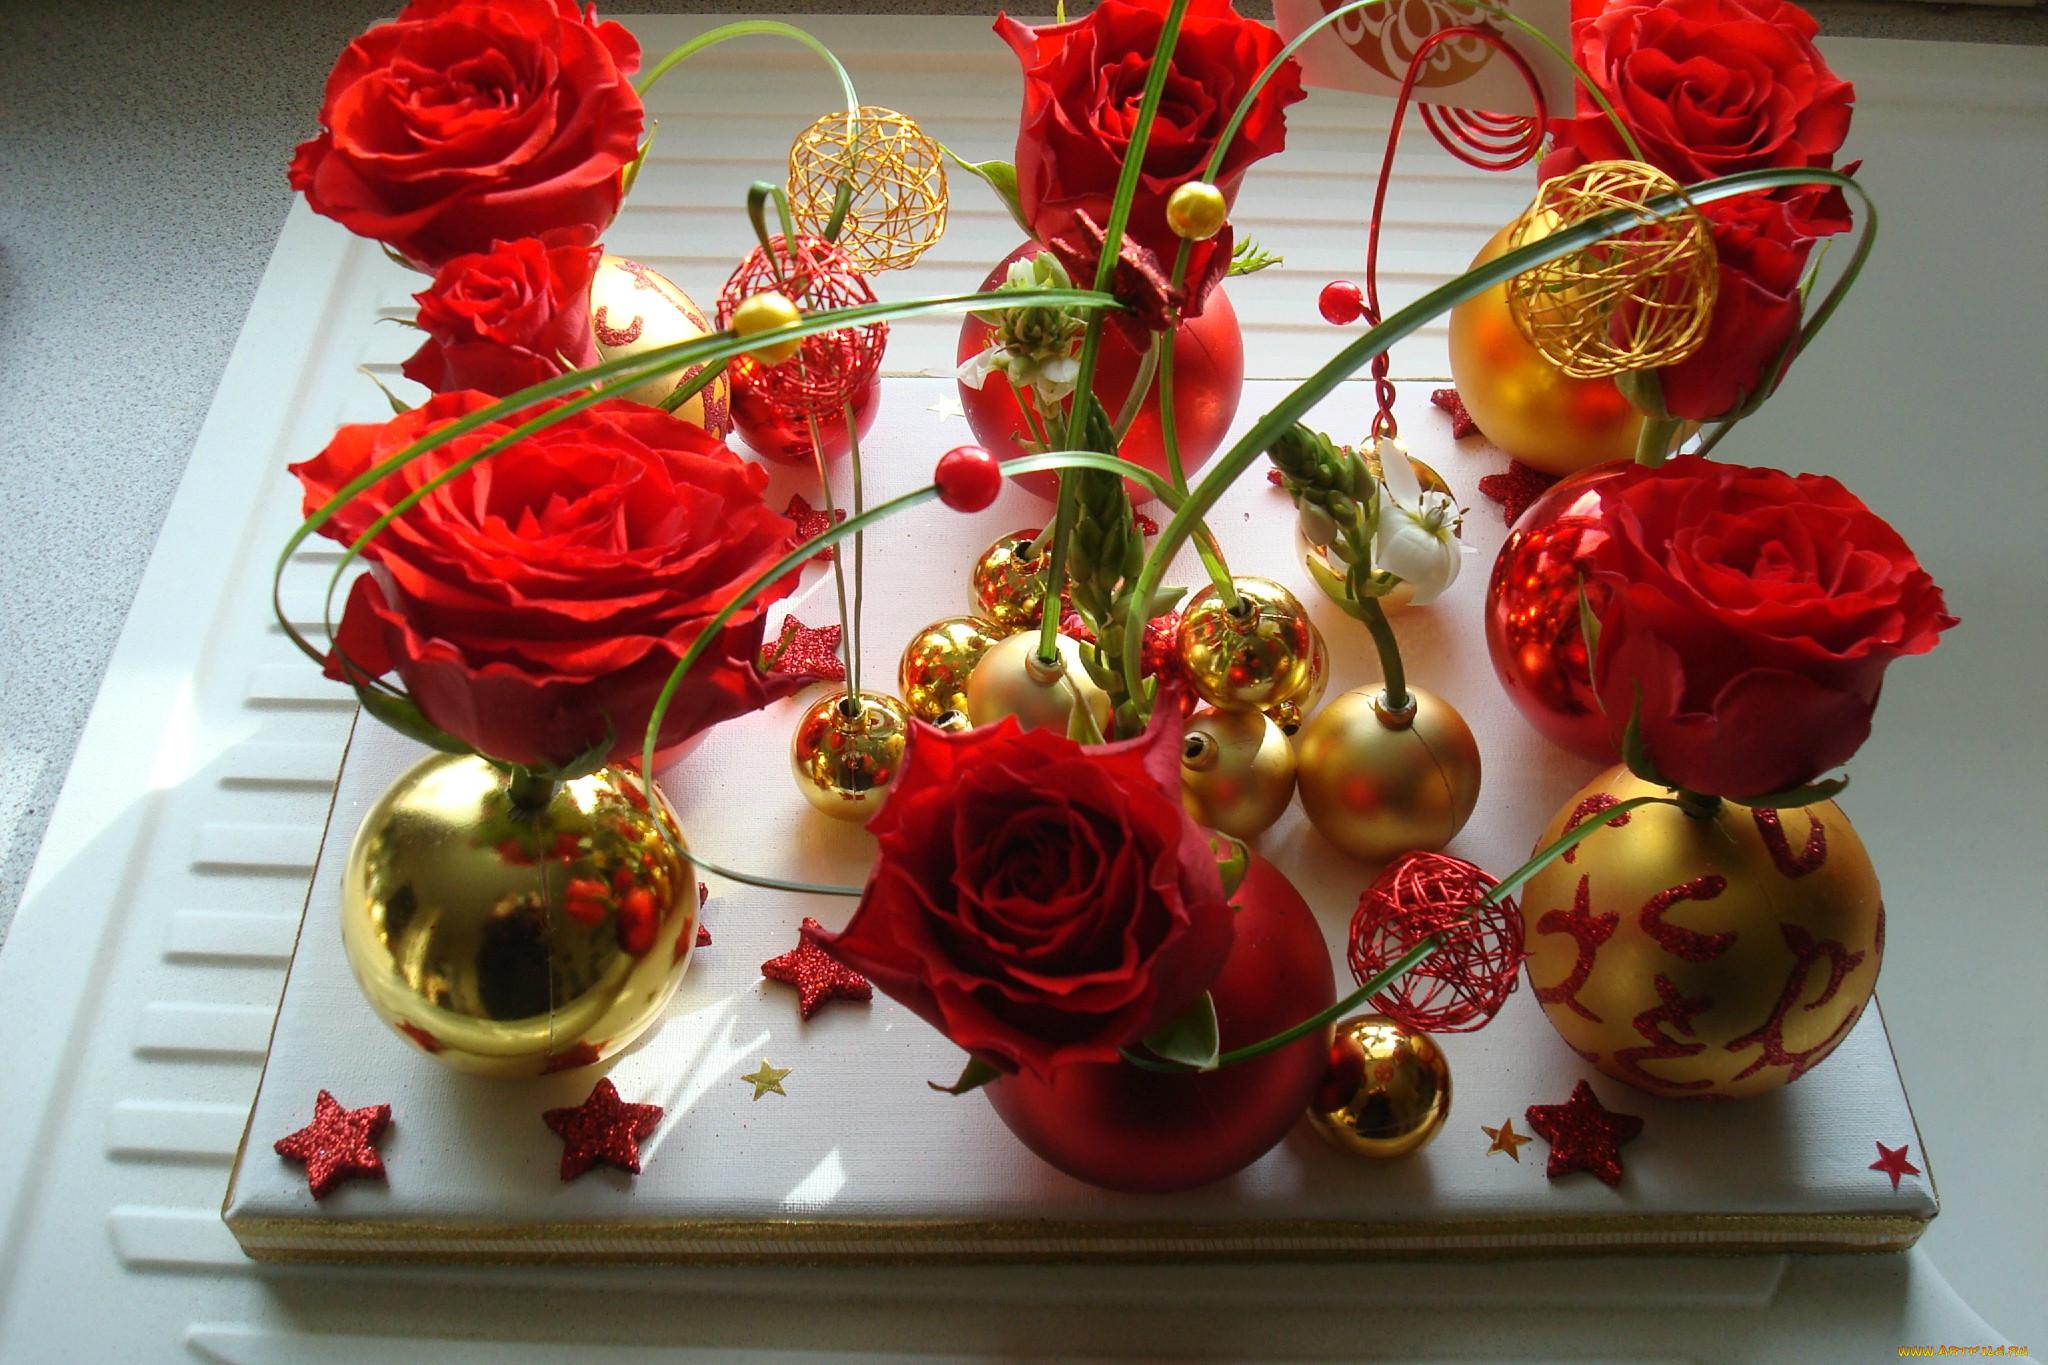 букет роз и шарики картинки часто